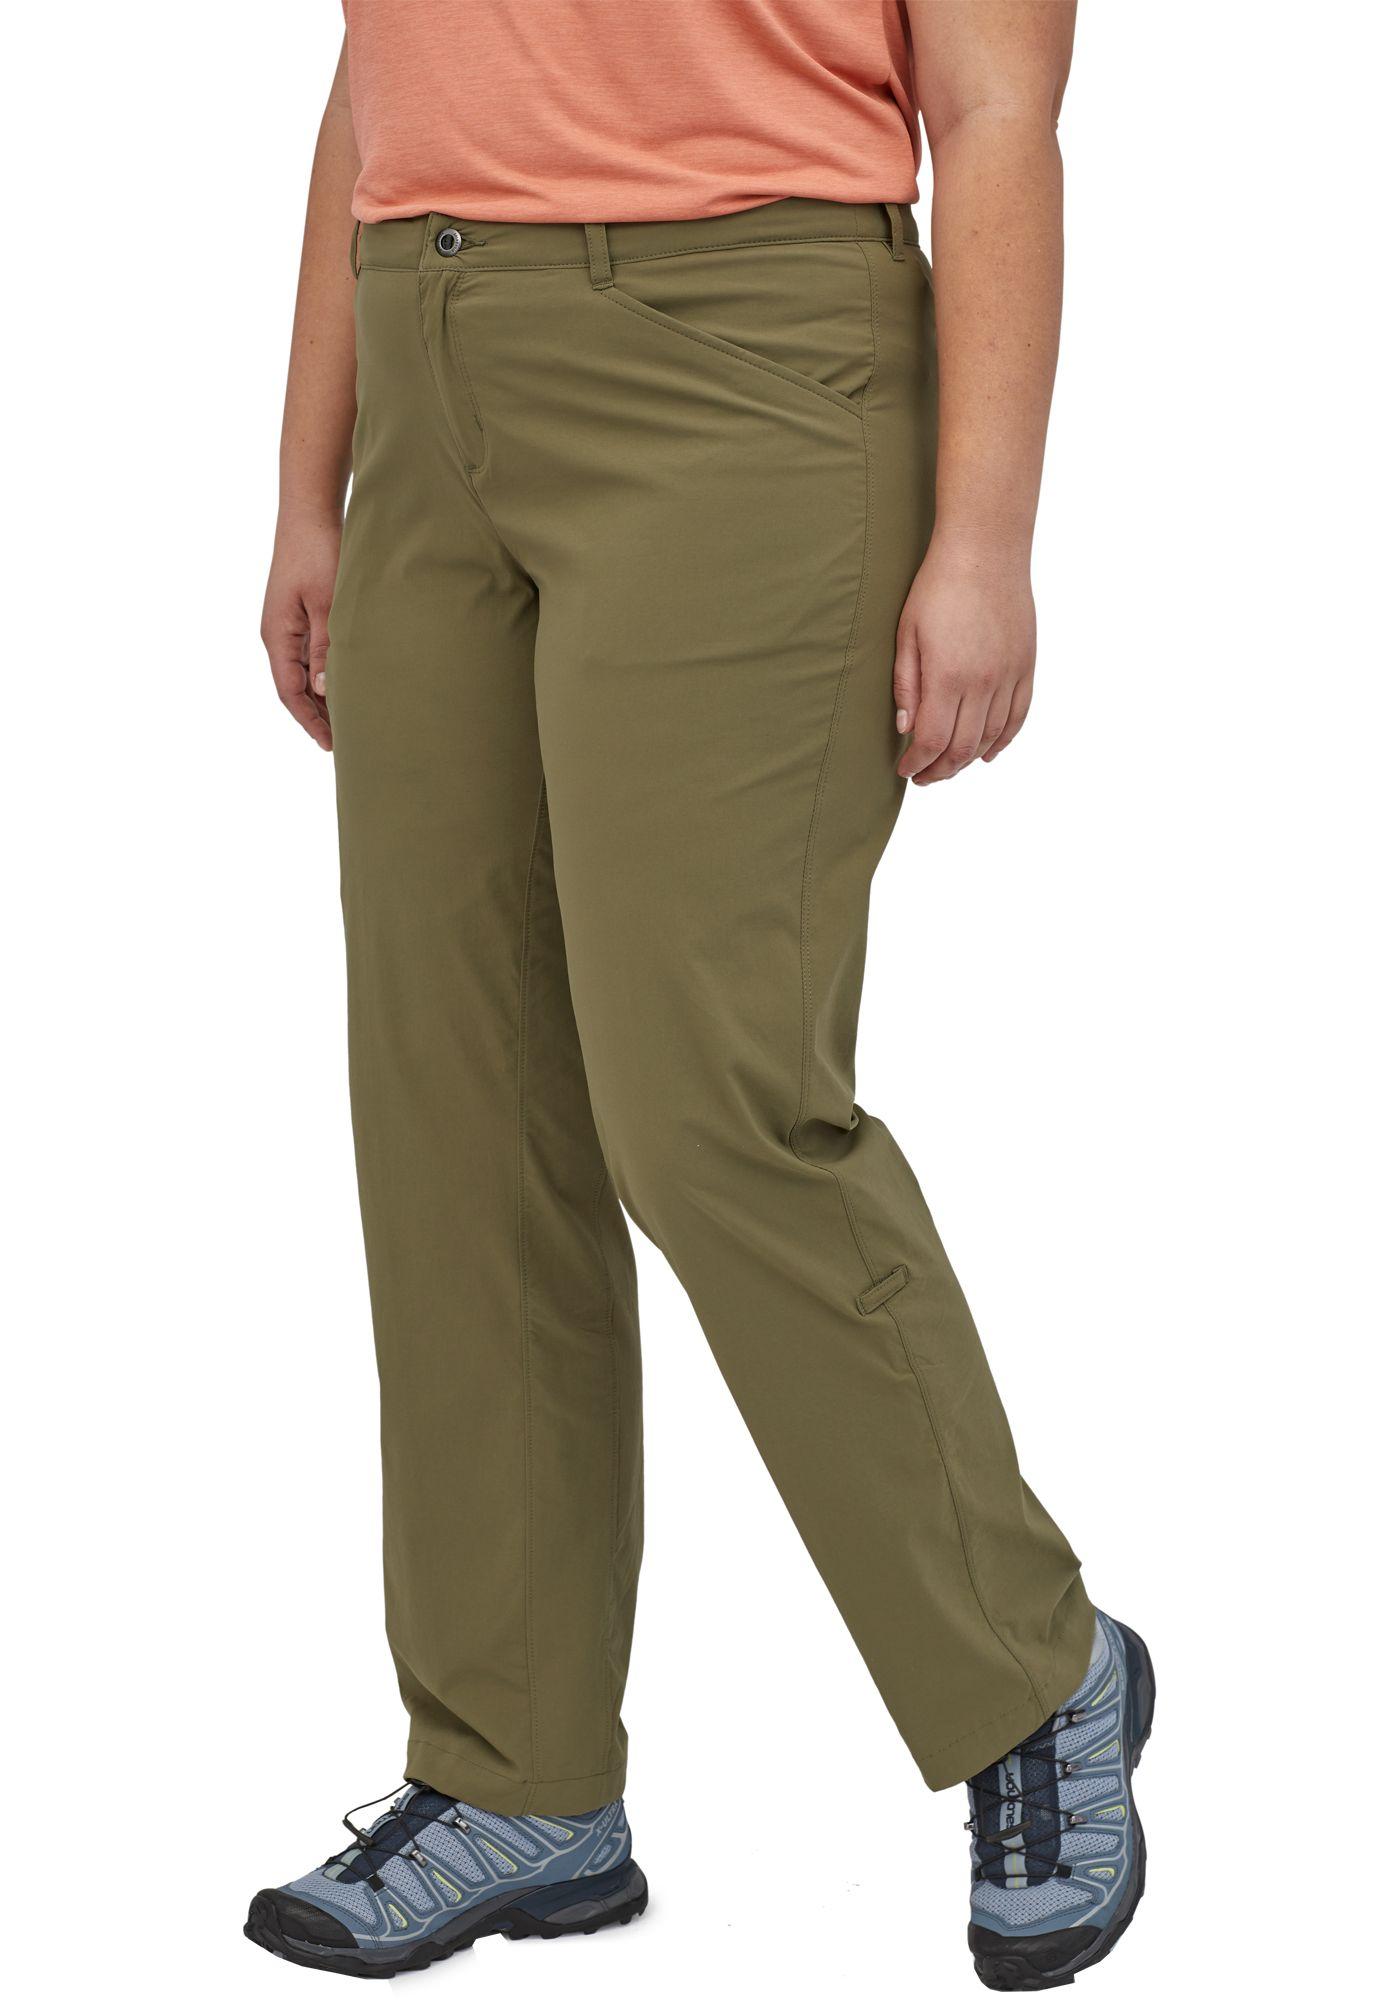 Patagonia Women's Quandary Pants